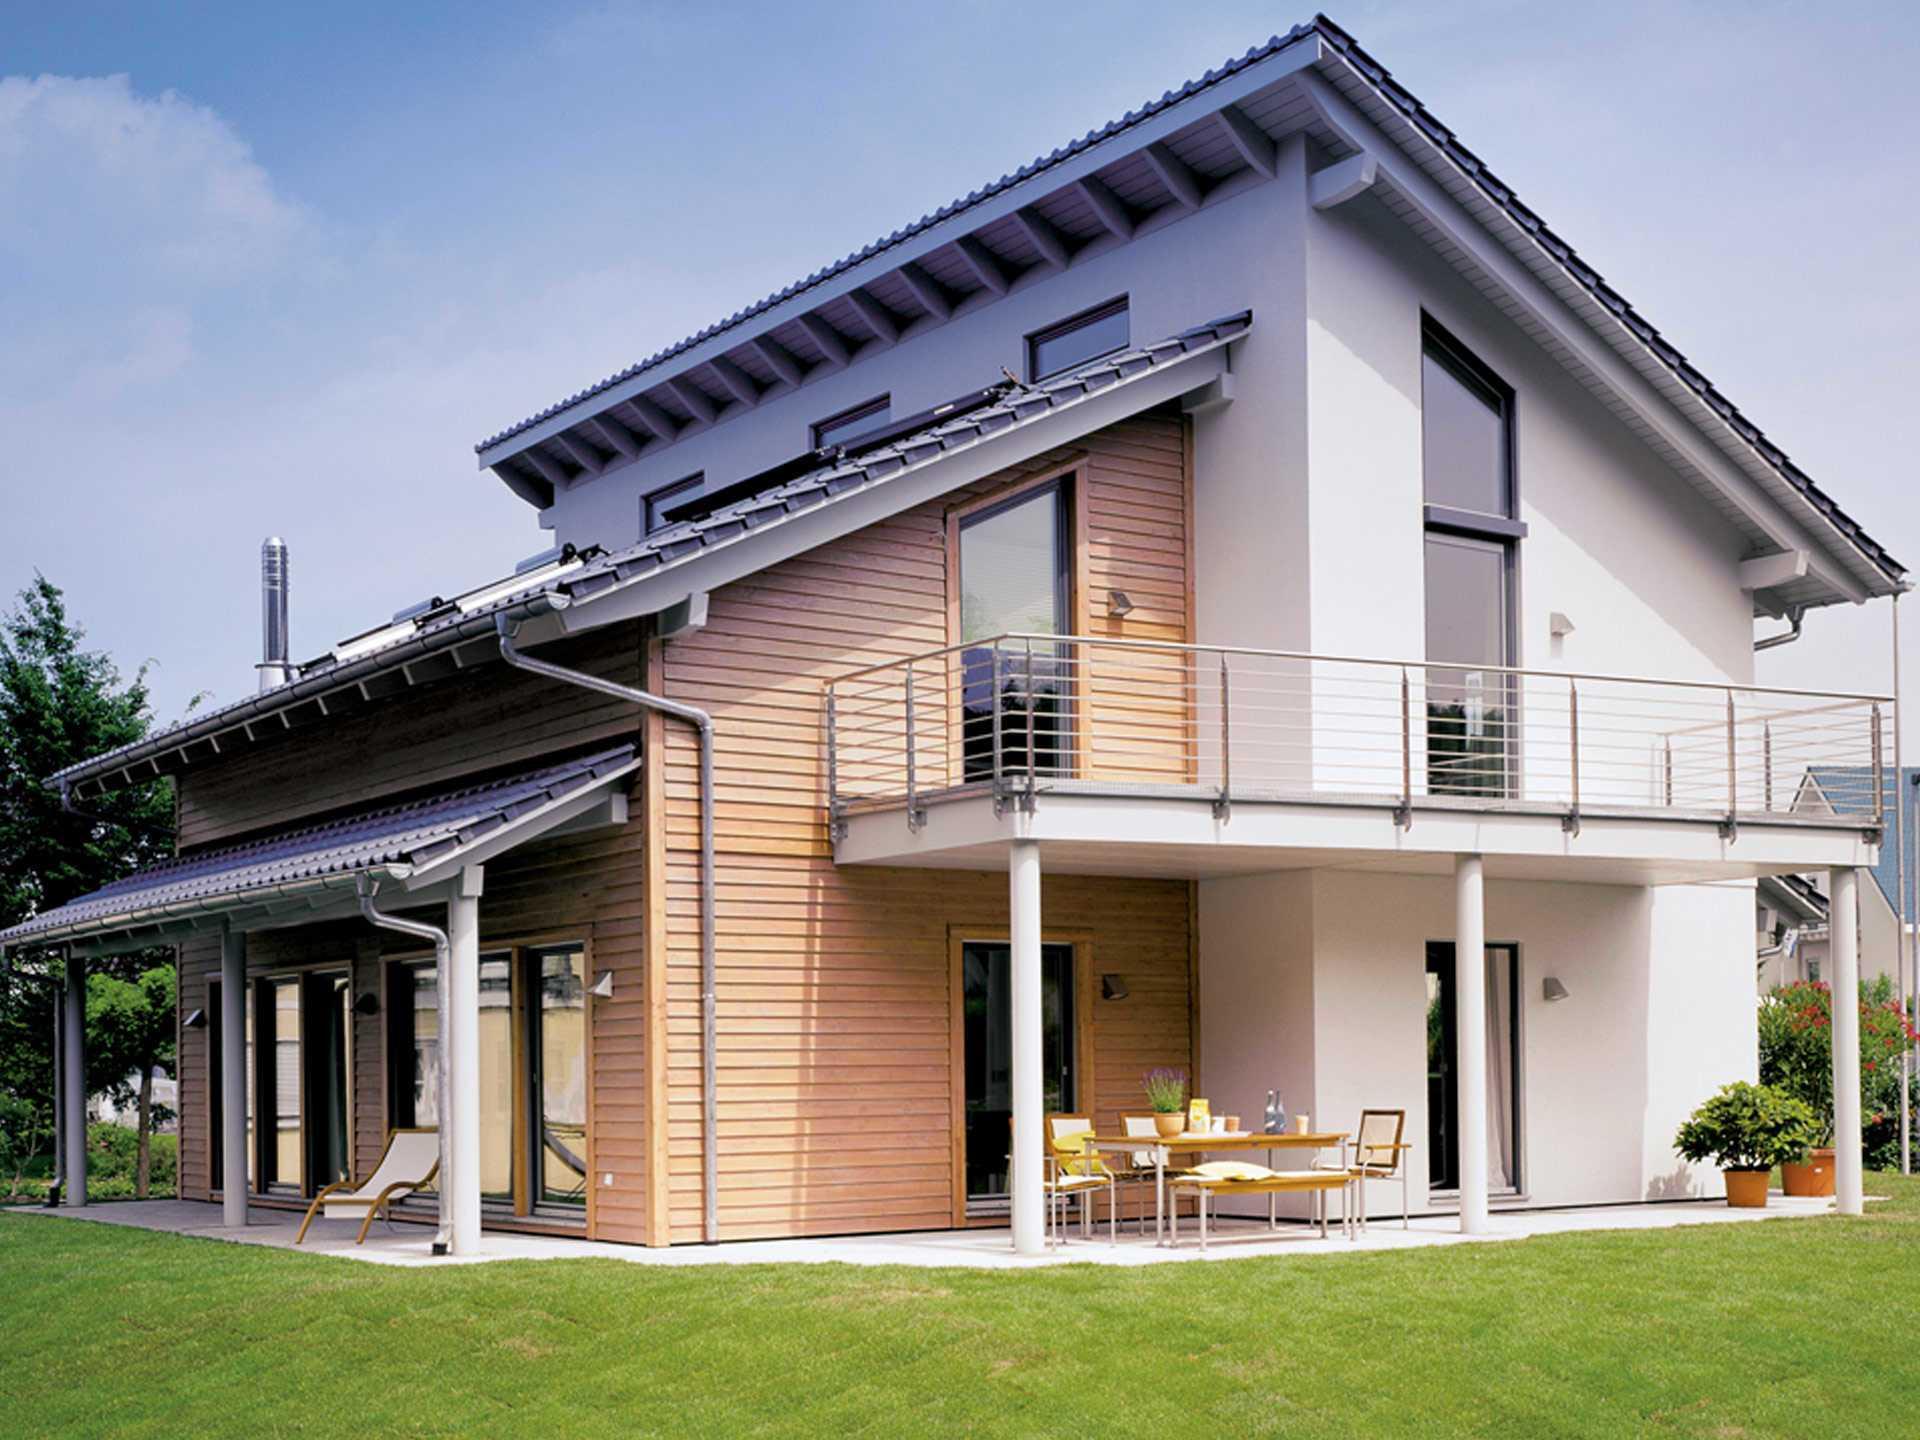 SchwörerHaus 3-Liter-Haus Plan 676.3, Bad Vilbel